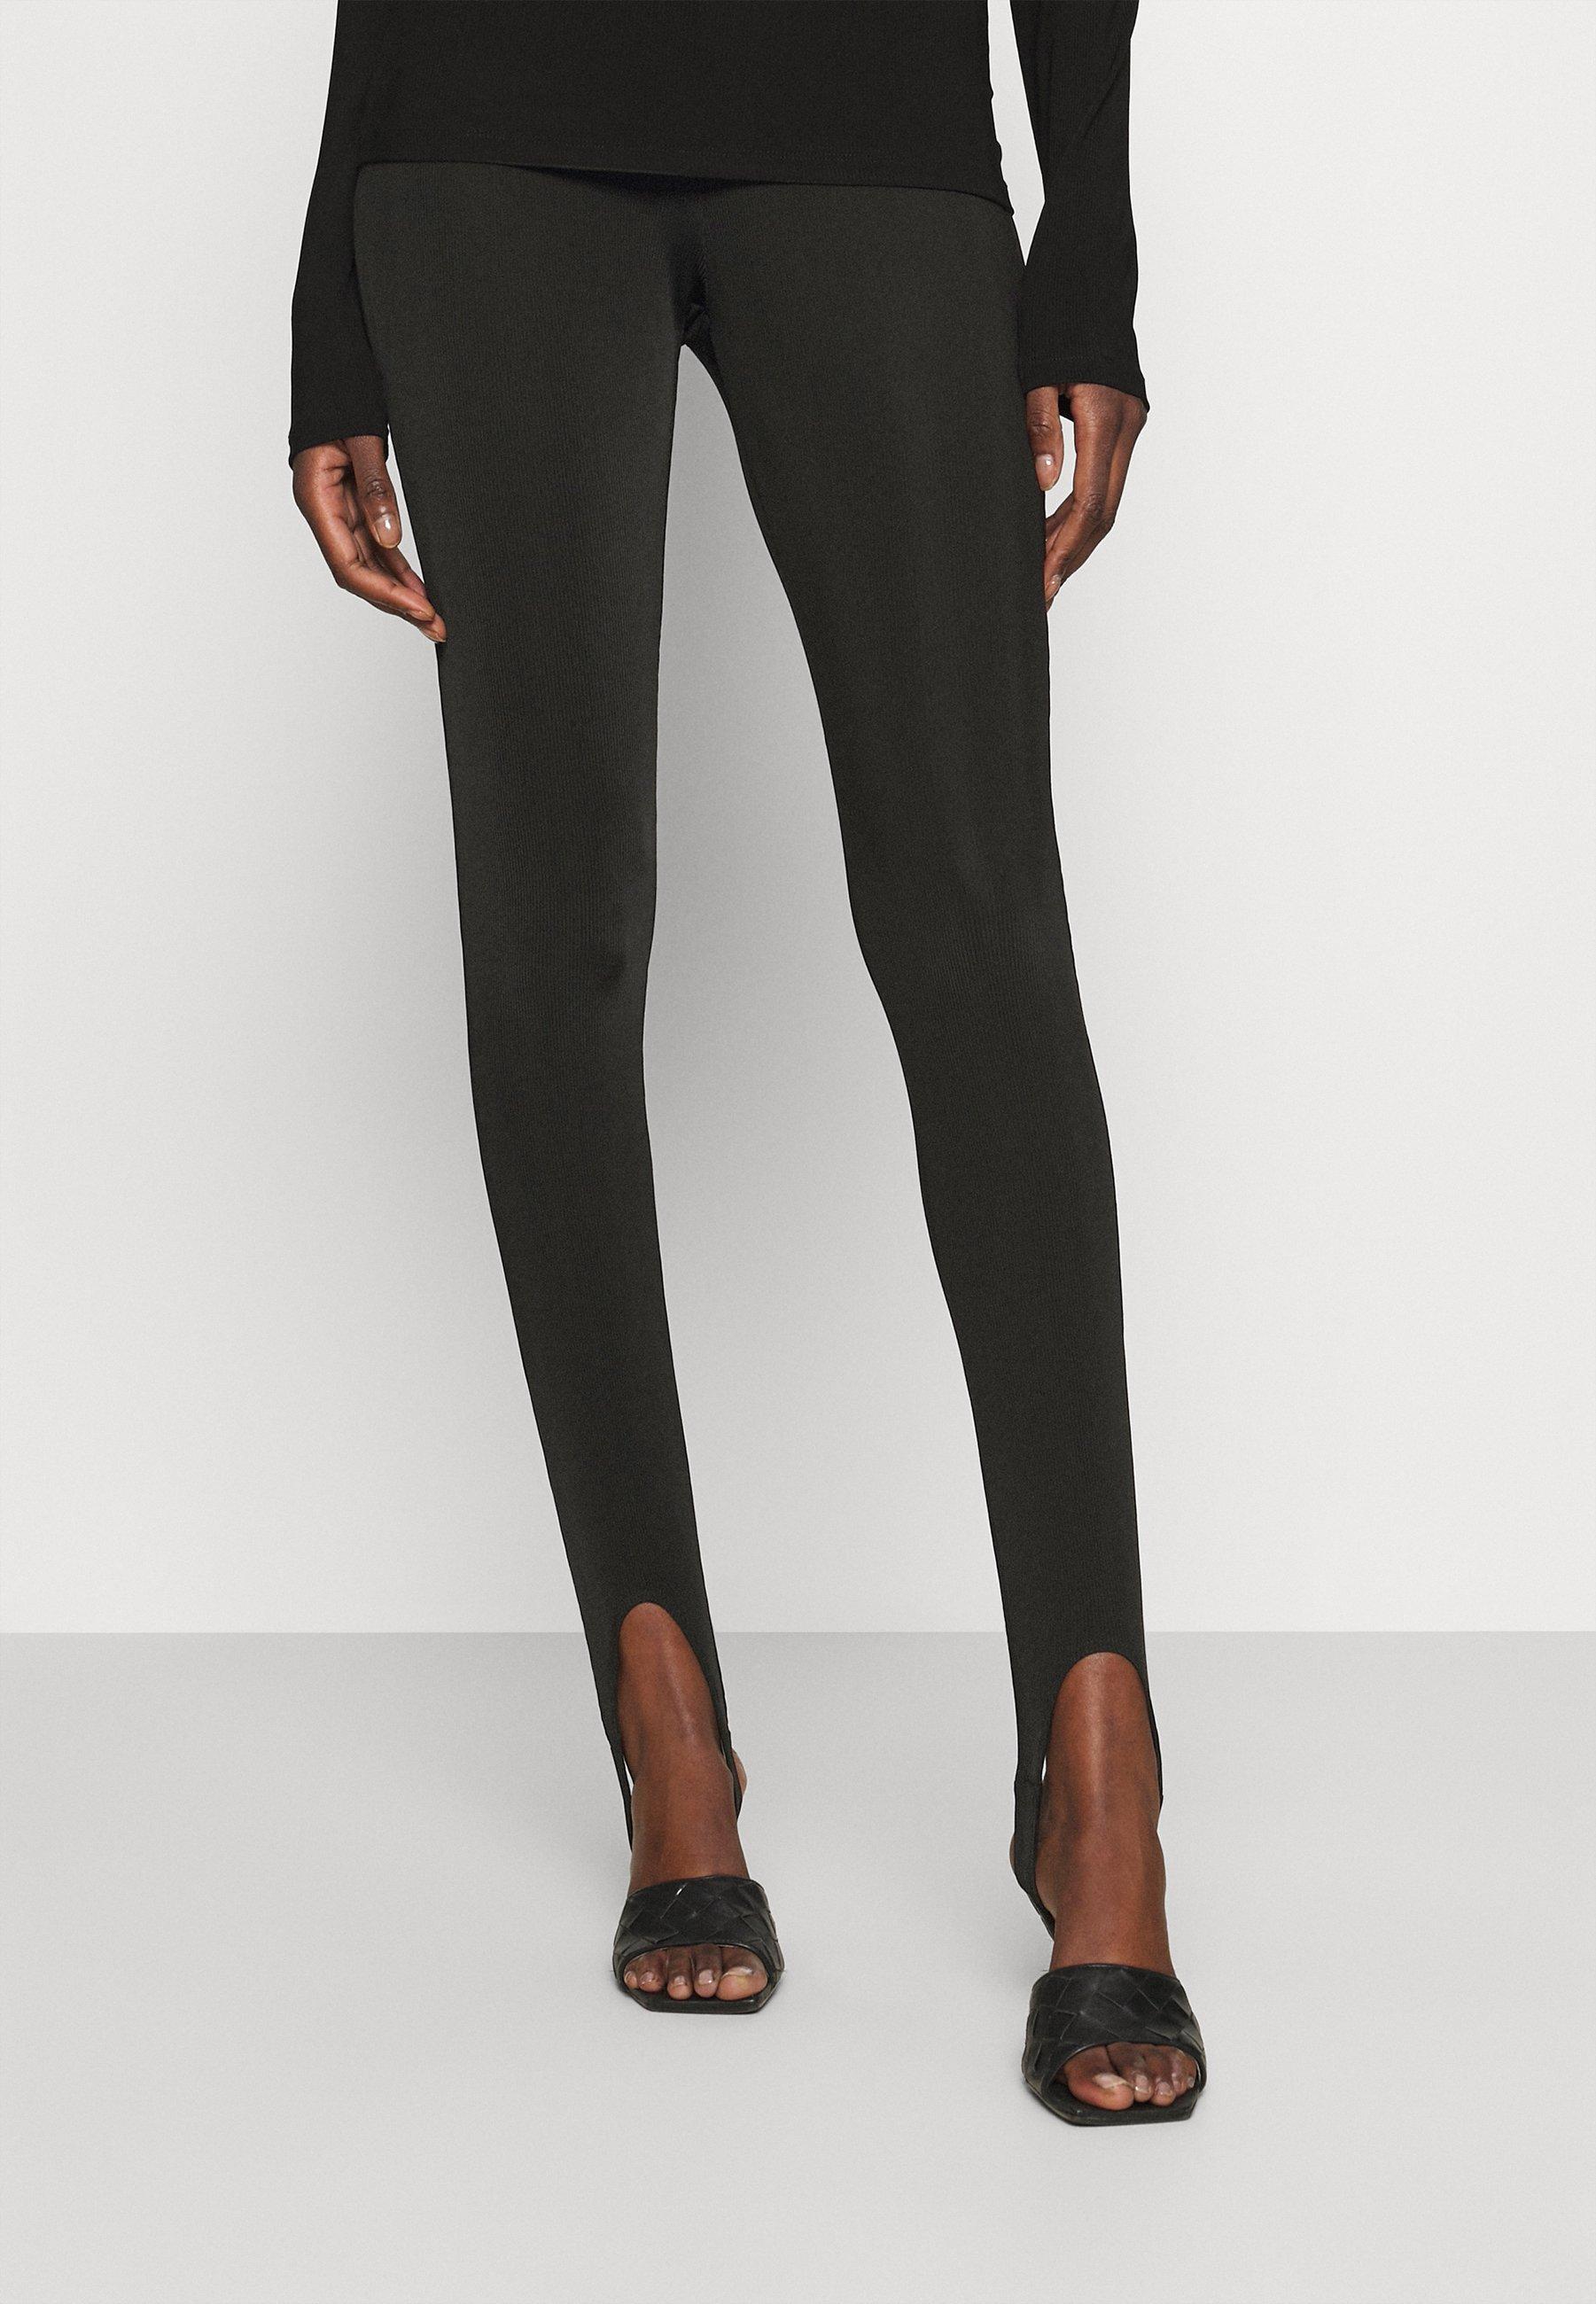 Damen RINGO - Leggings - Hosen